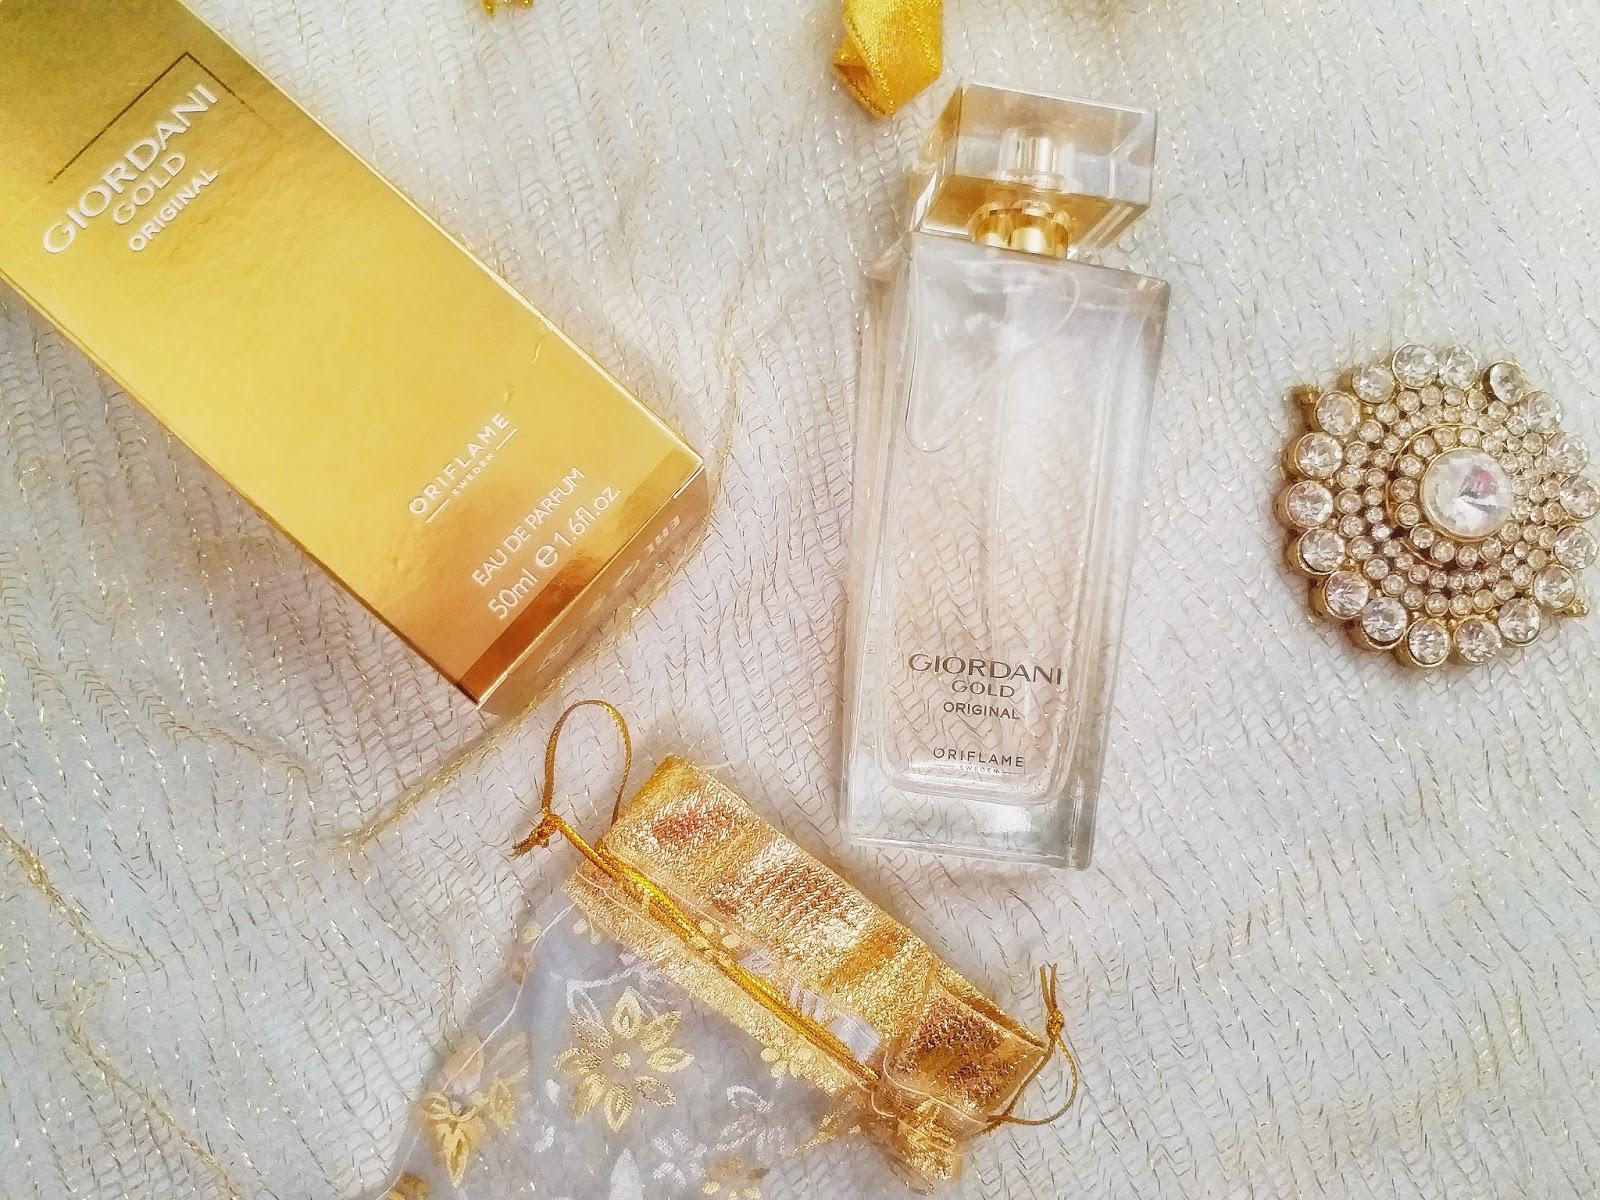 Beauty Beyond Oriflame Giordani Gold Original Edp For Women